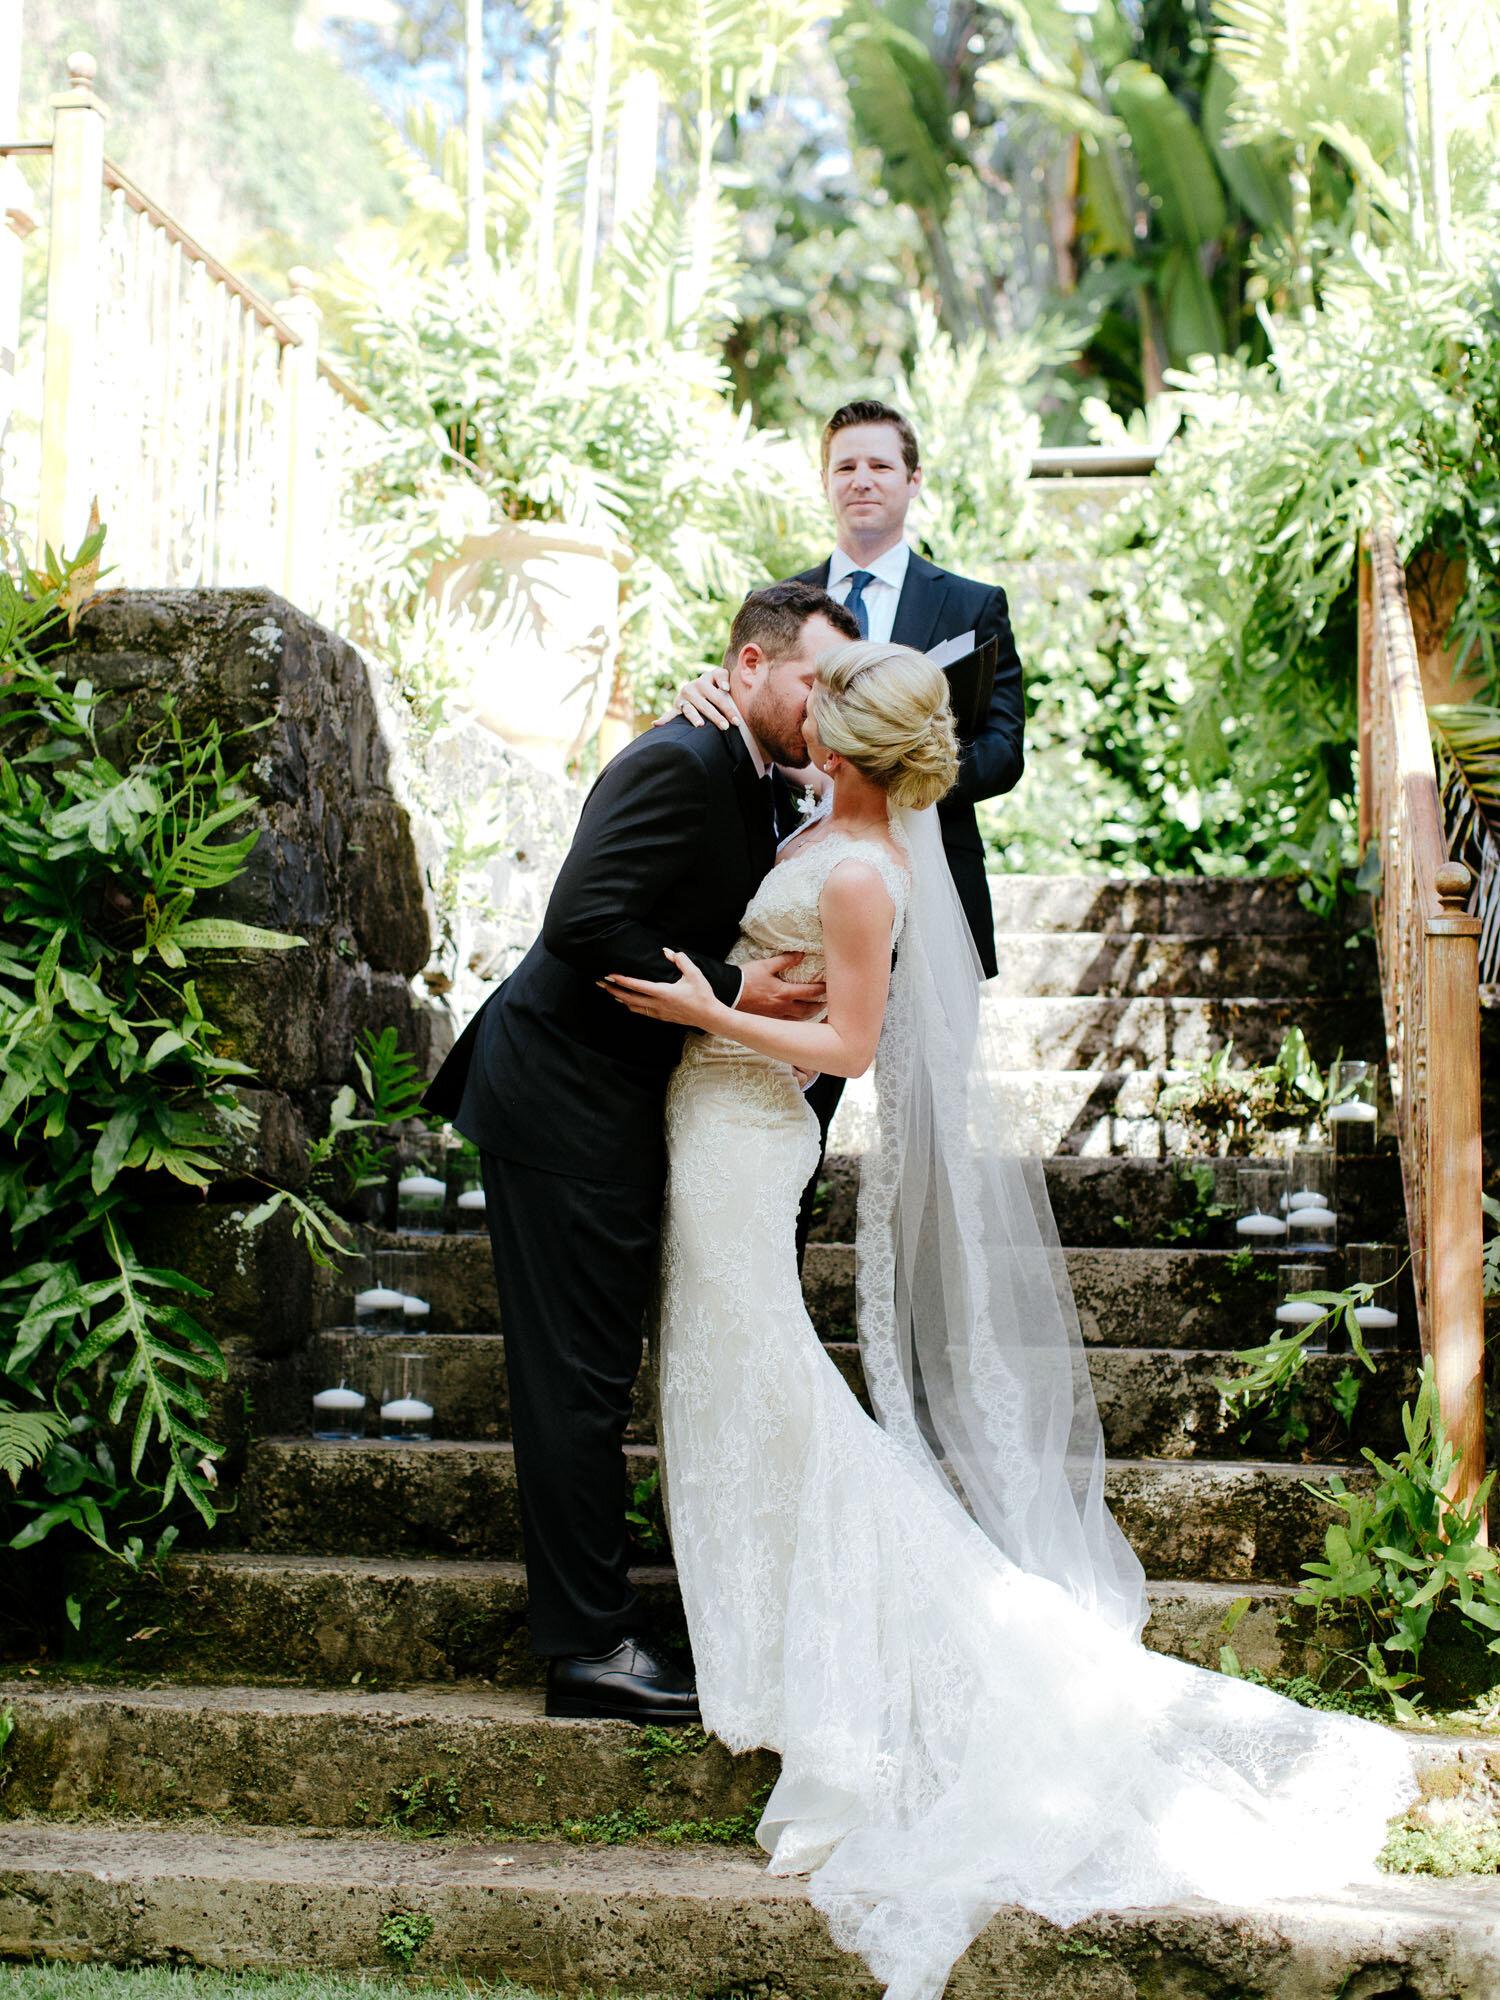 Chris-J-Evans-Maui-Wedding-Kim&Brian2654.jpg